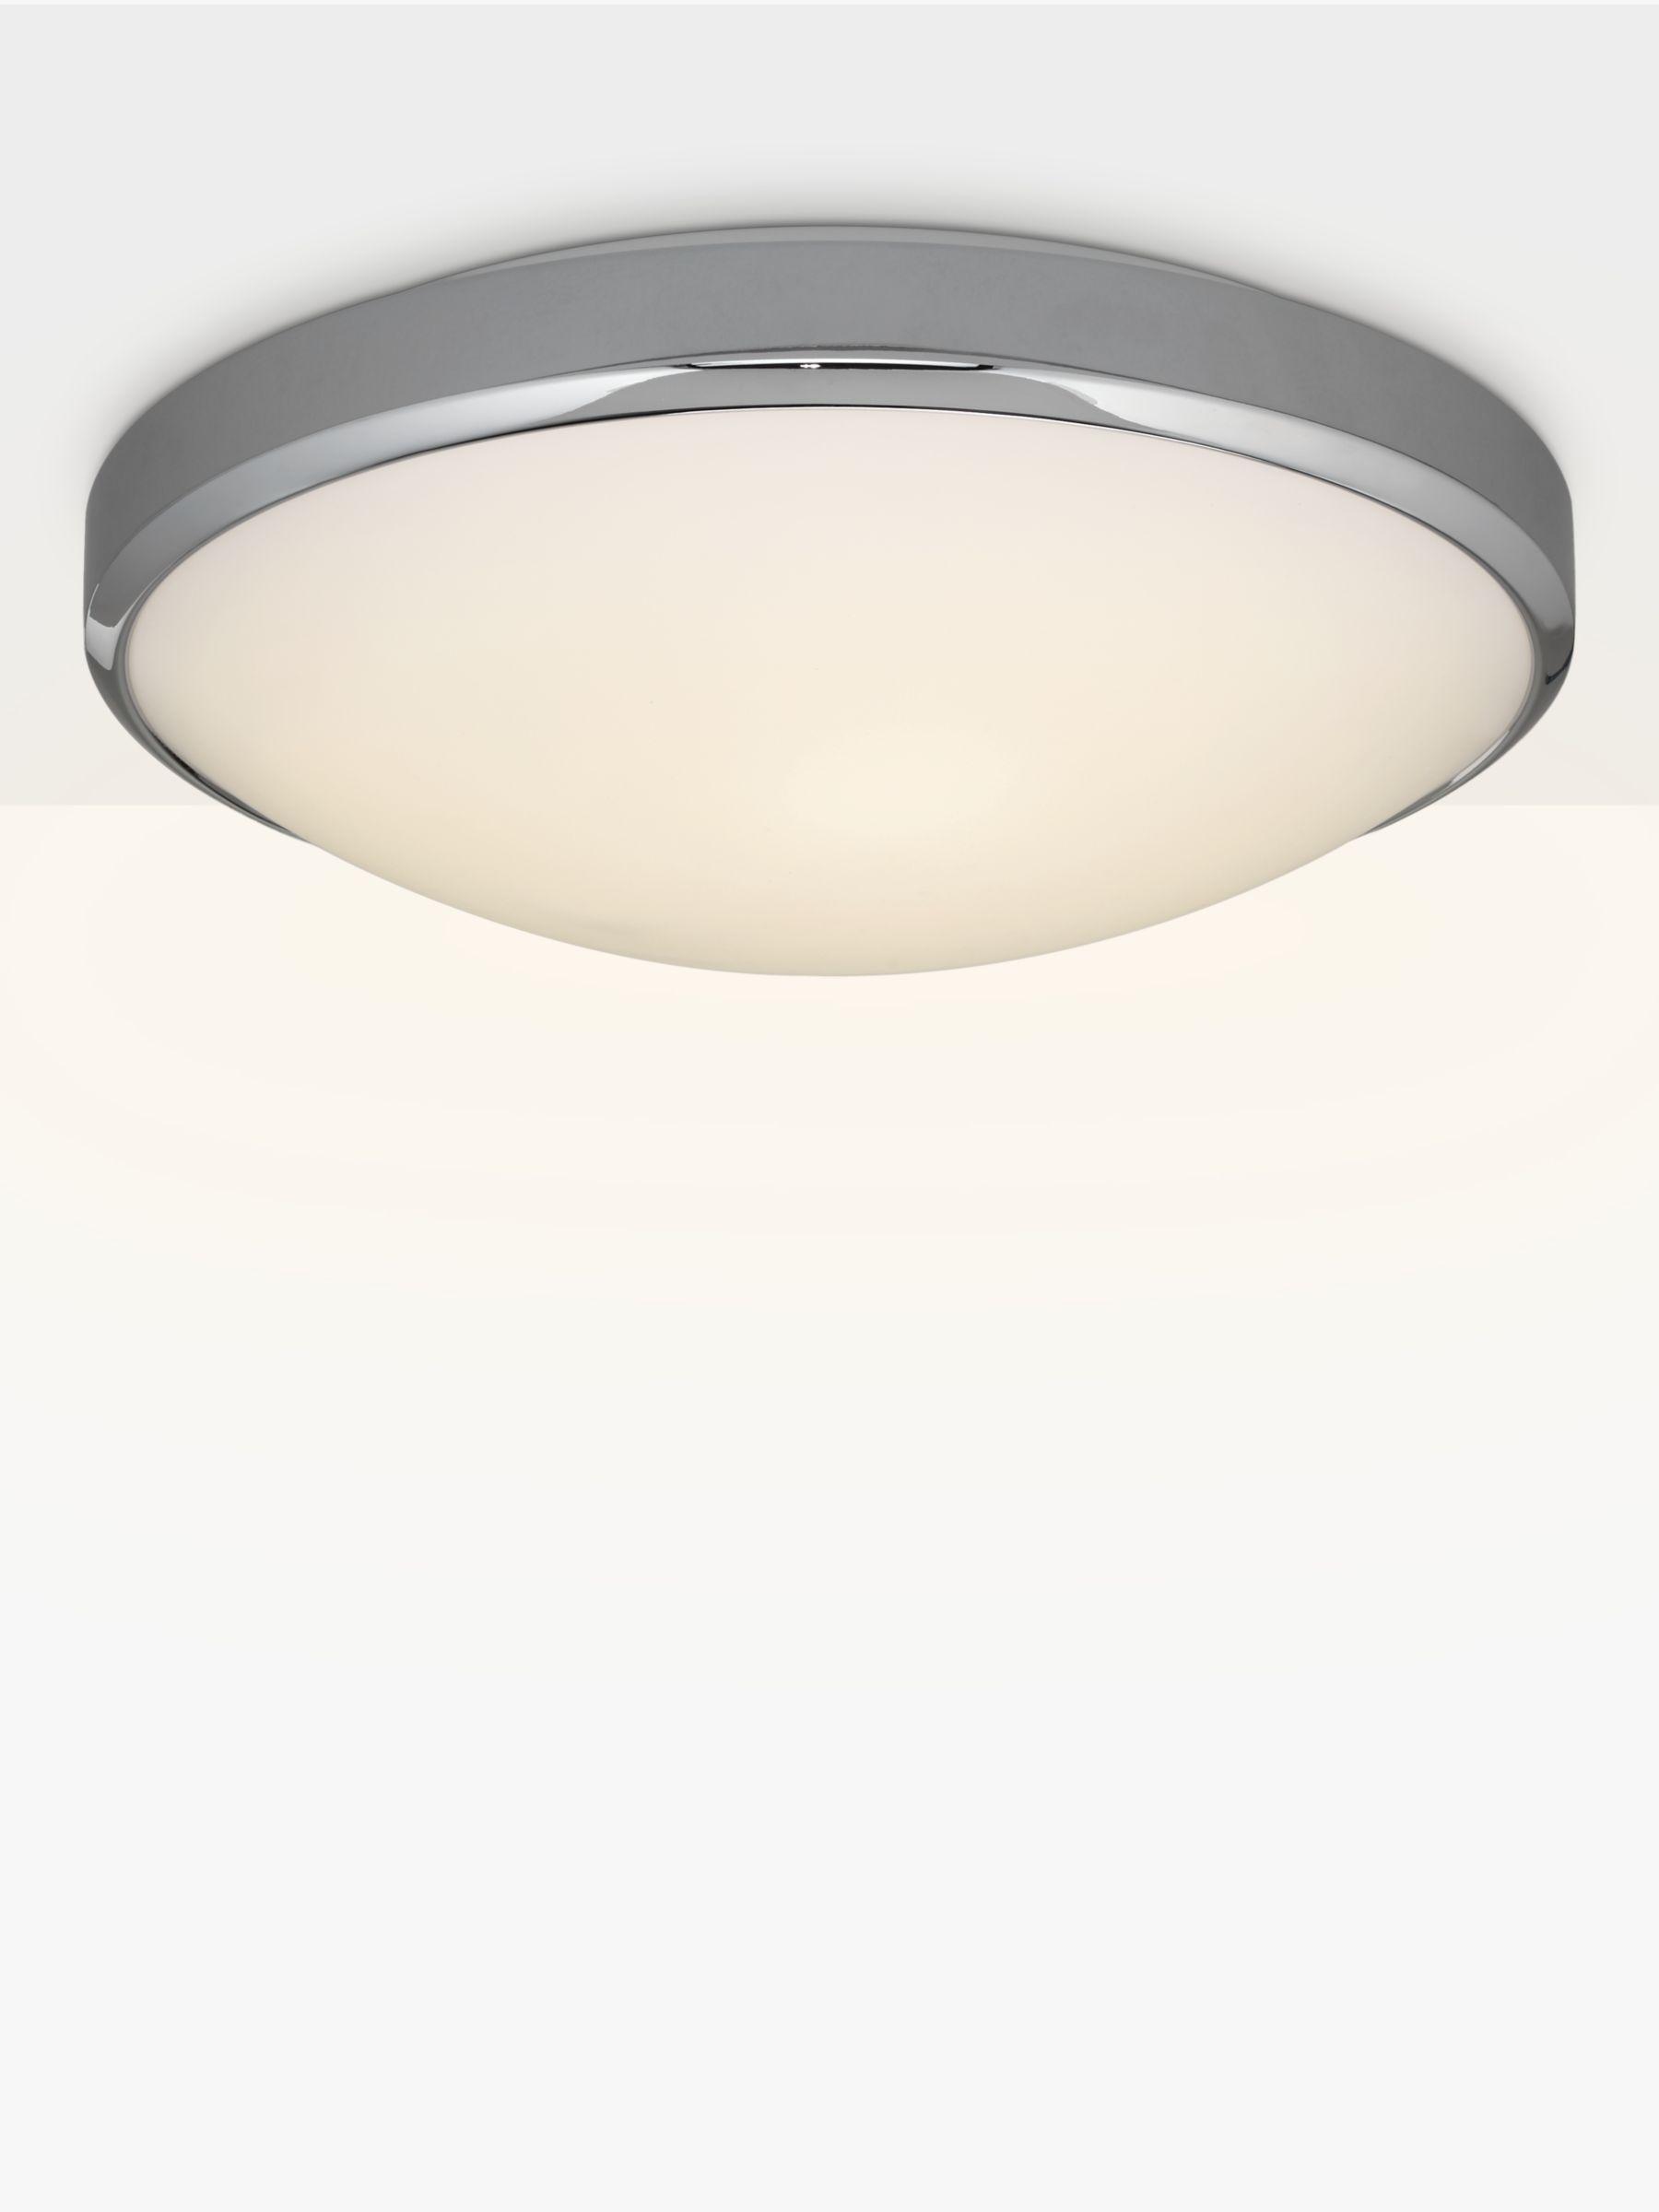 ASTRO Astro Osaka LED Bathroom Light, White/Chrome